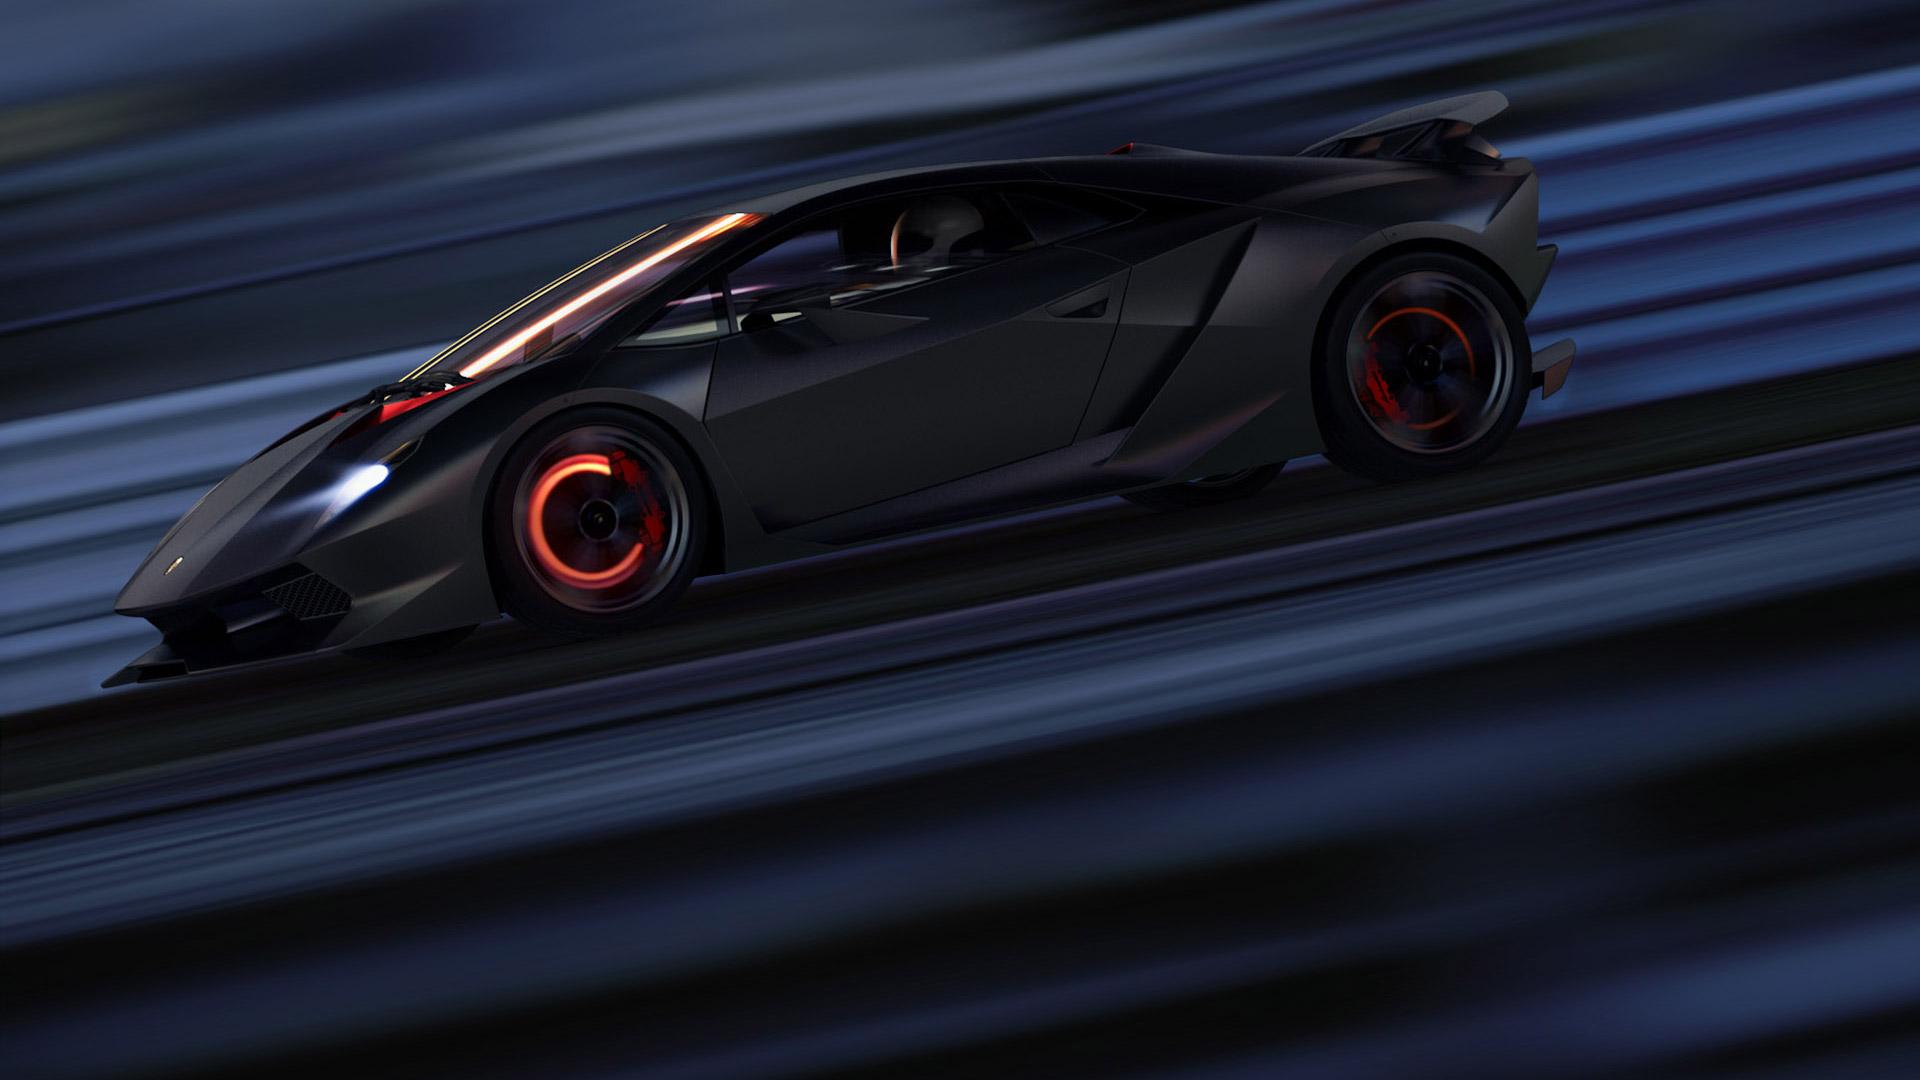 Lamborghini Announces Limited-Run Production Of The Sesto ... |Lamborghini Sesto Elemento Speed